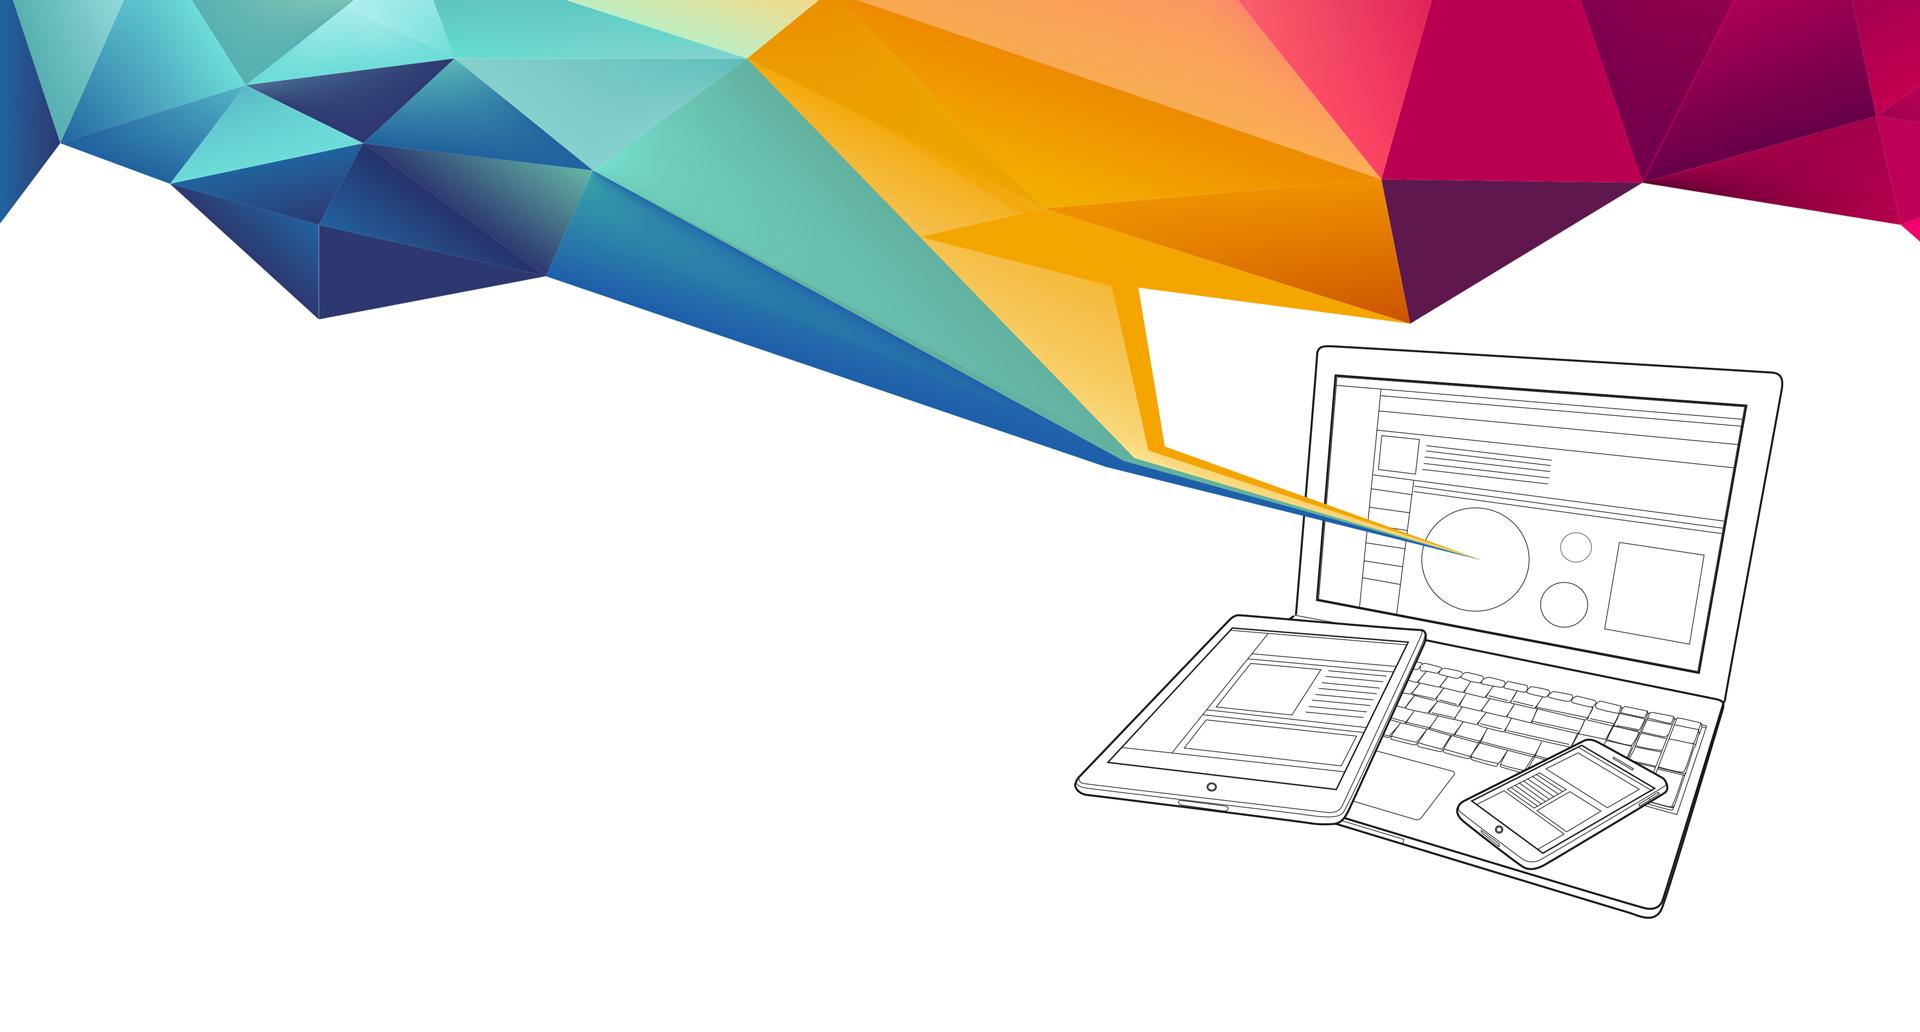 Vektorgrafik Laptop, Handy, Tablet